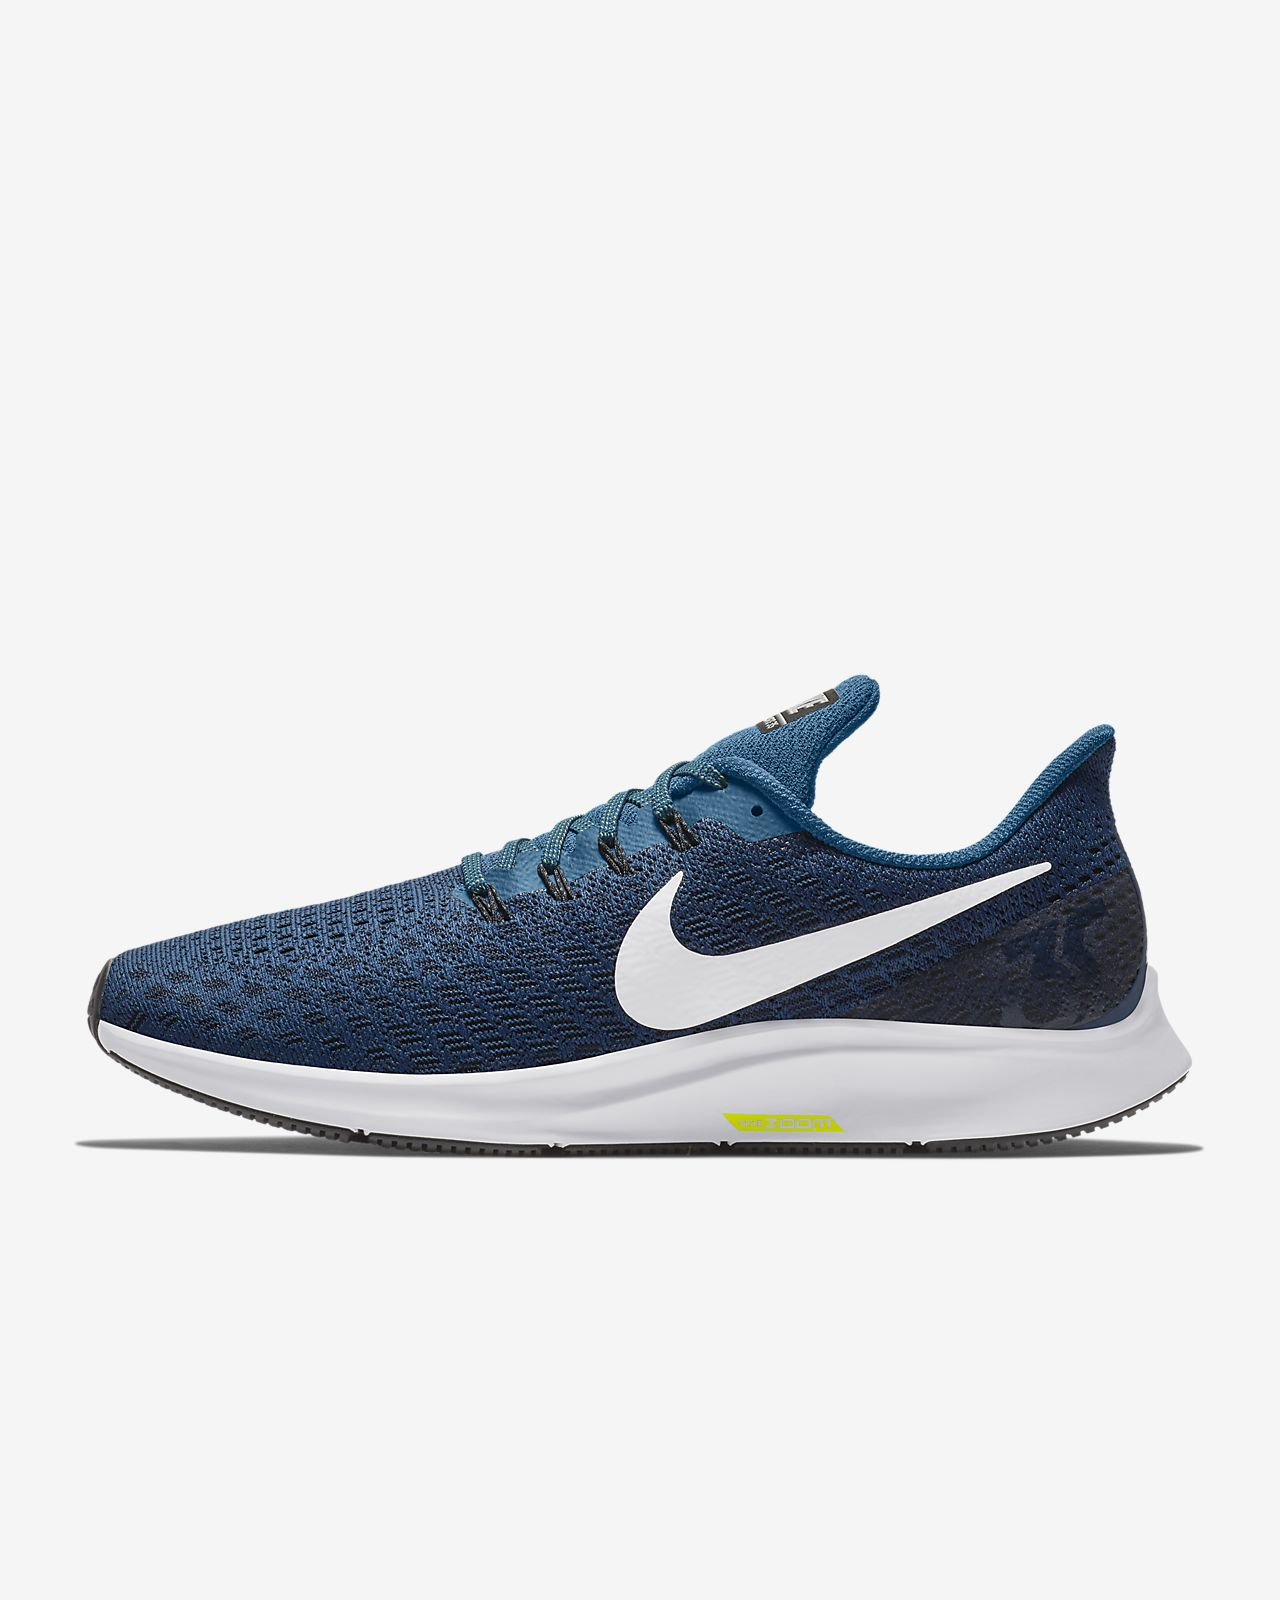 promo code 1583f 3cf20 ... Chaussure de running Nike Air Zoom Pegasus 35 pour Homme